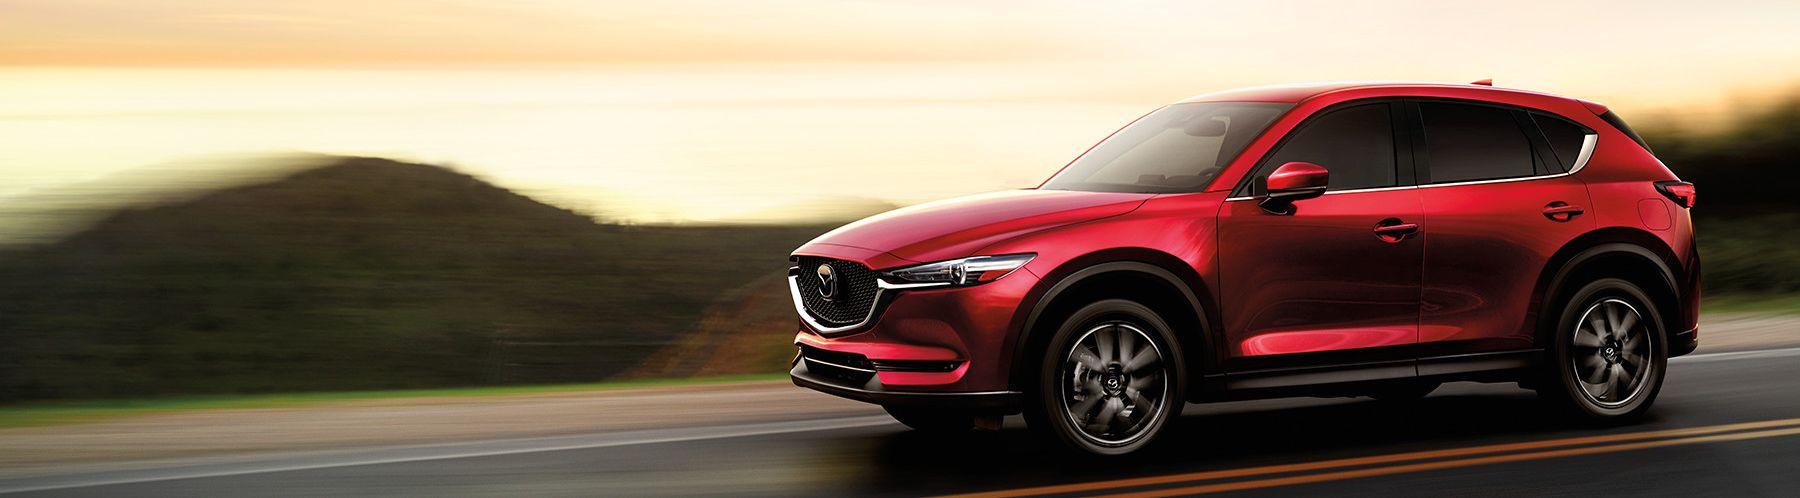 2017 Mazda CX-5 for Sale near Houston, TX - Mazda of Clear Lake